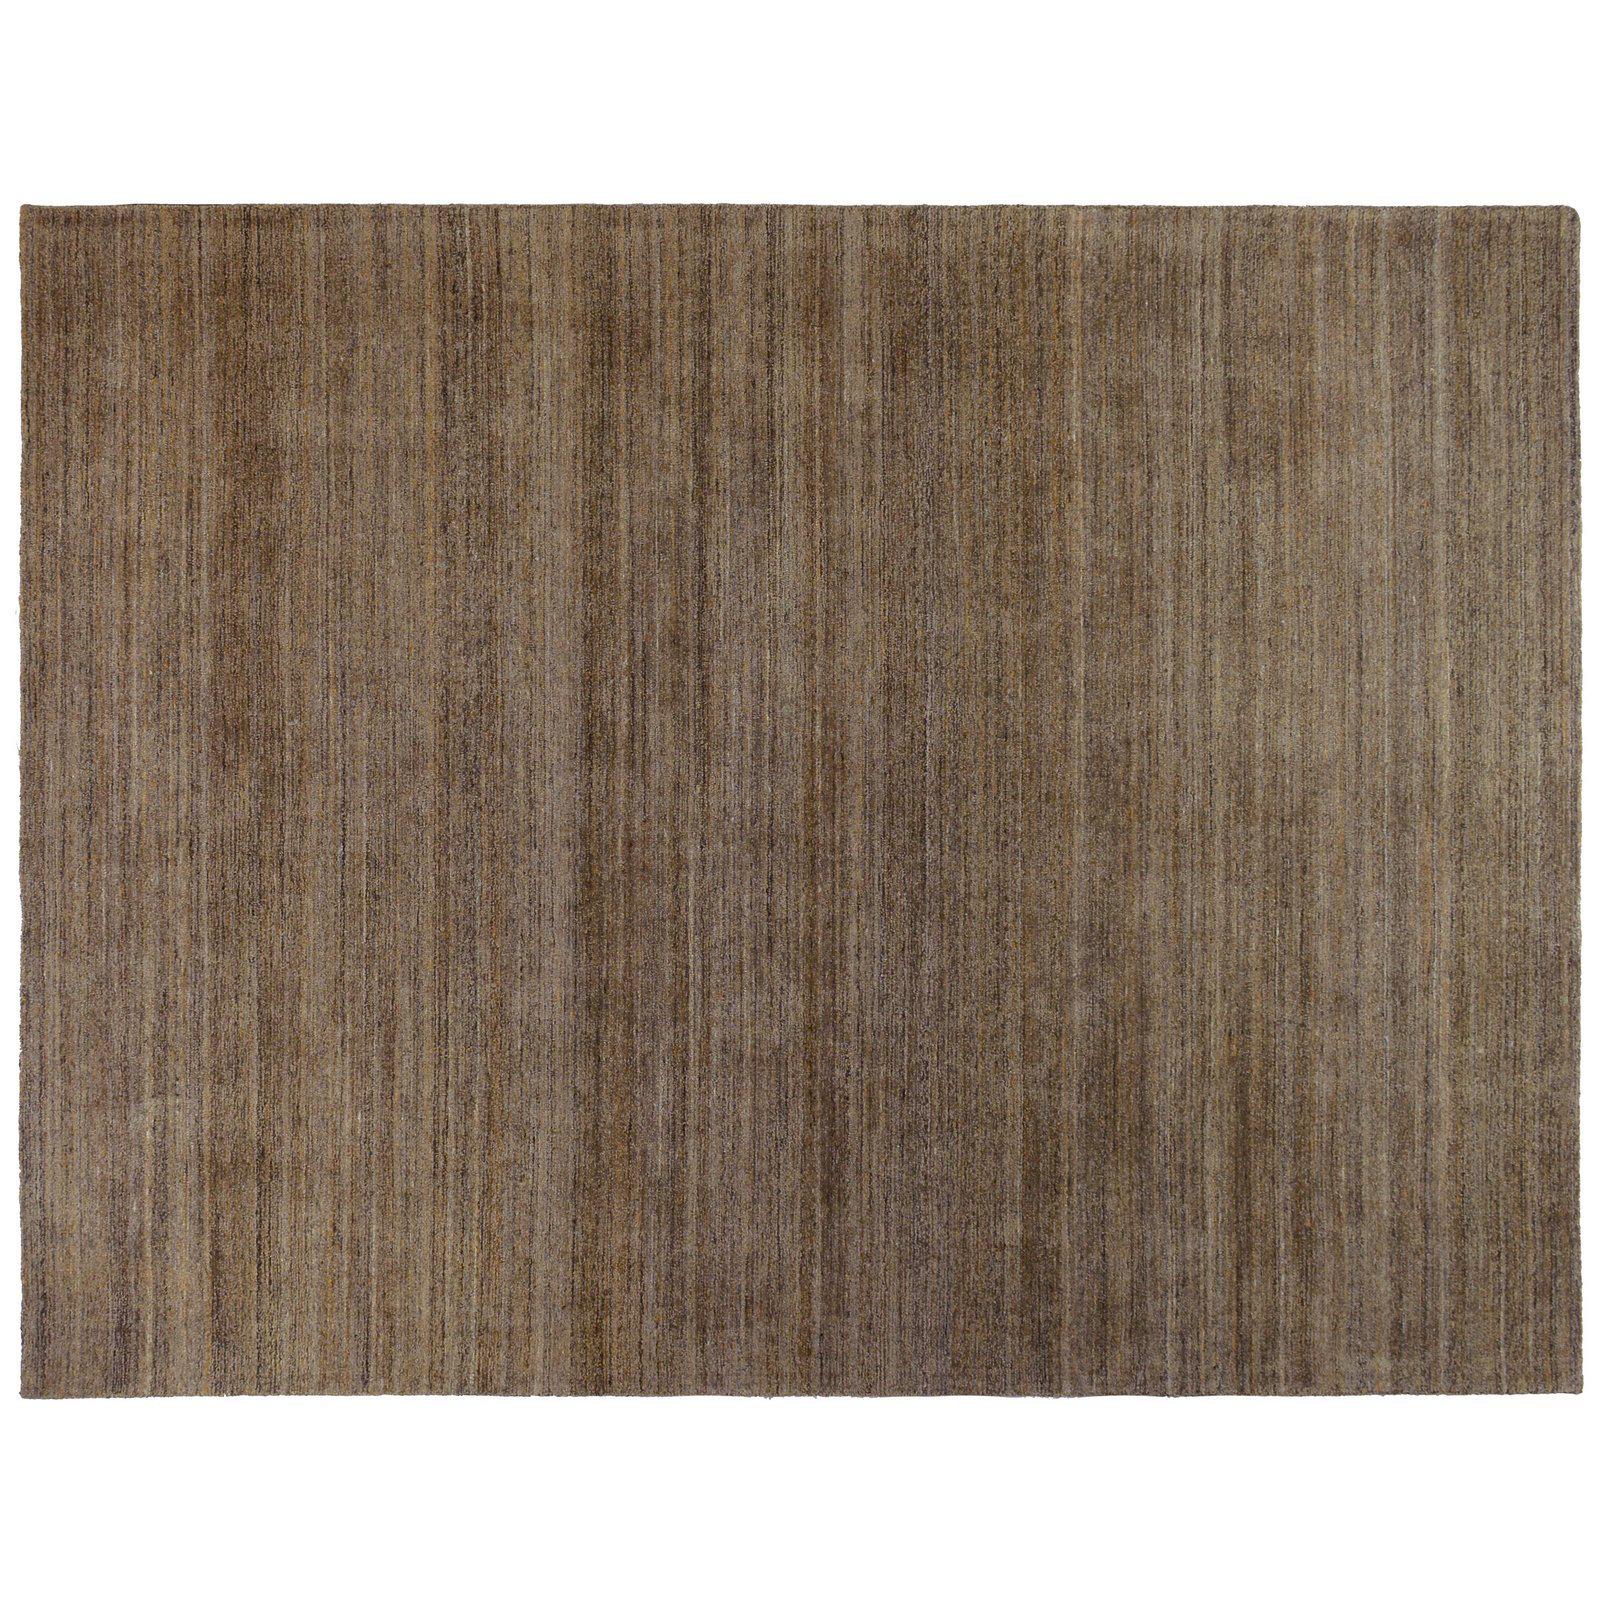 Aga John Oriental Rugs Hand Tufted Wool Brown Area Rug